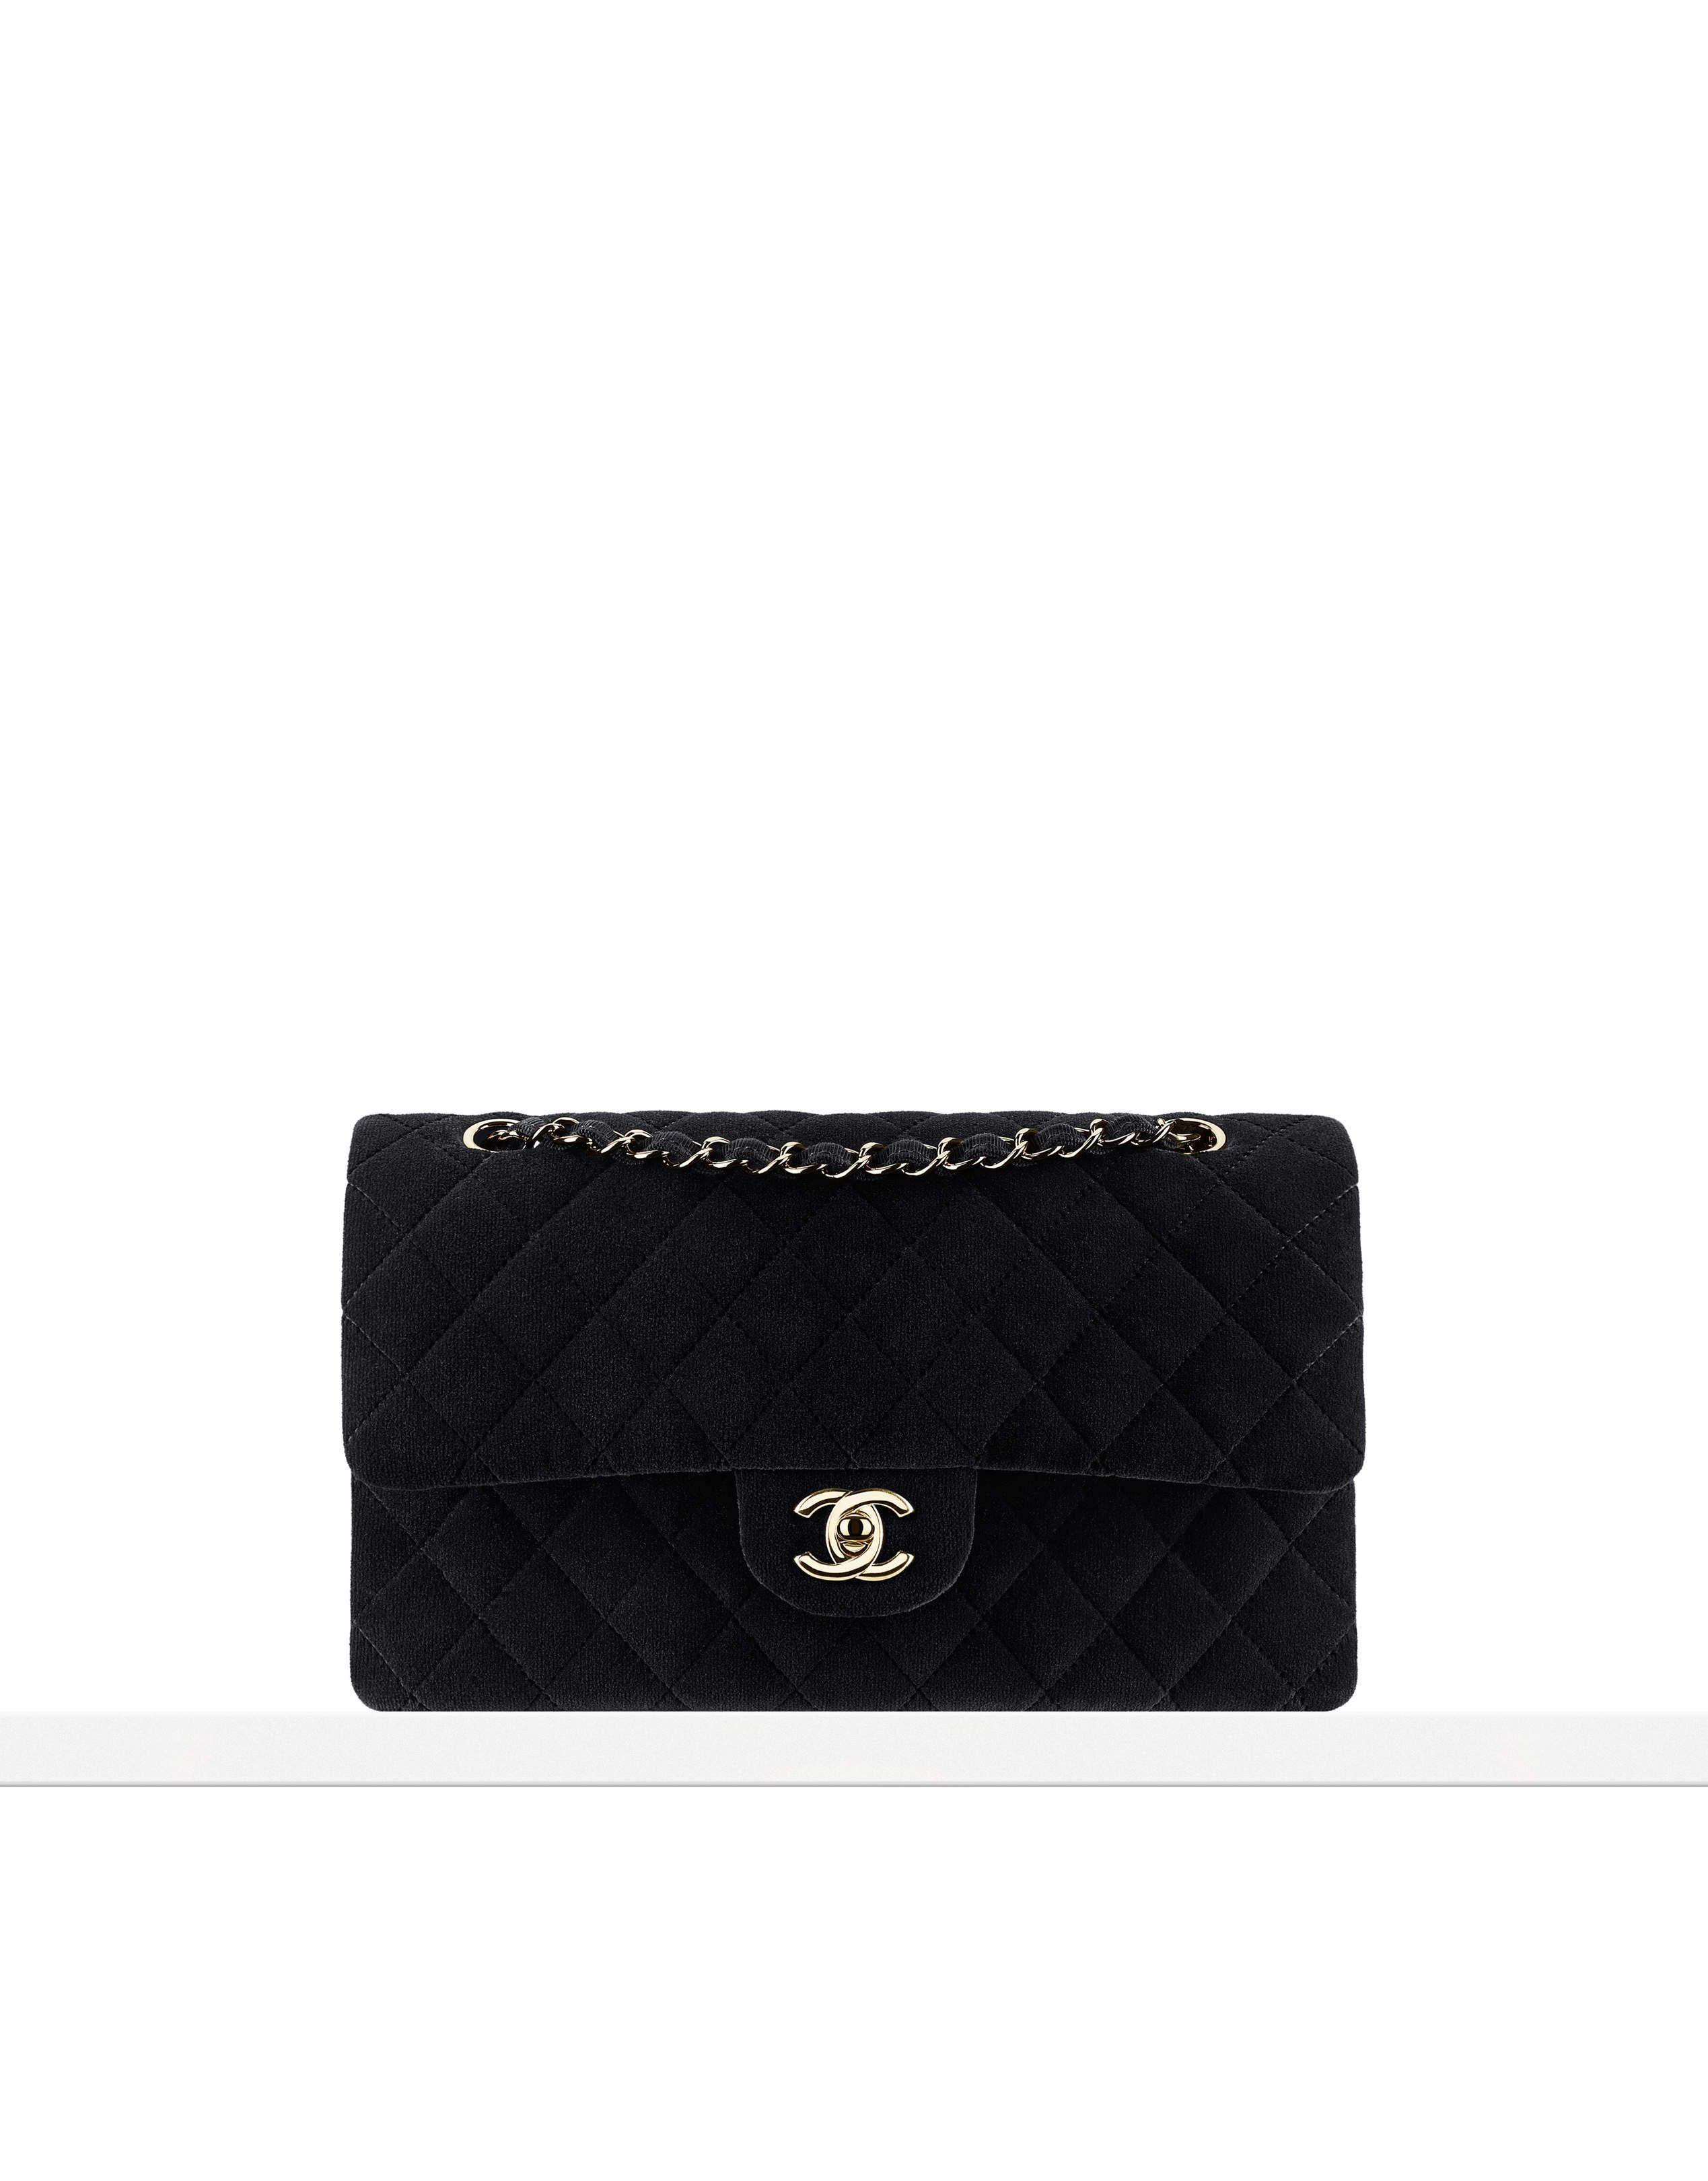 ac0bd6c5287c Chanel Classic Flap black velvet + gold hardware | pinterest: @Blancazh